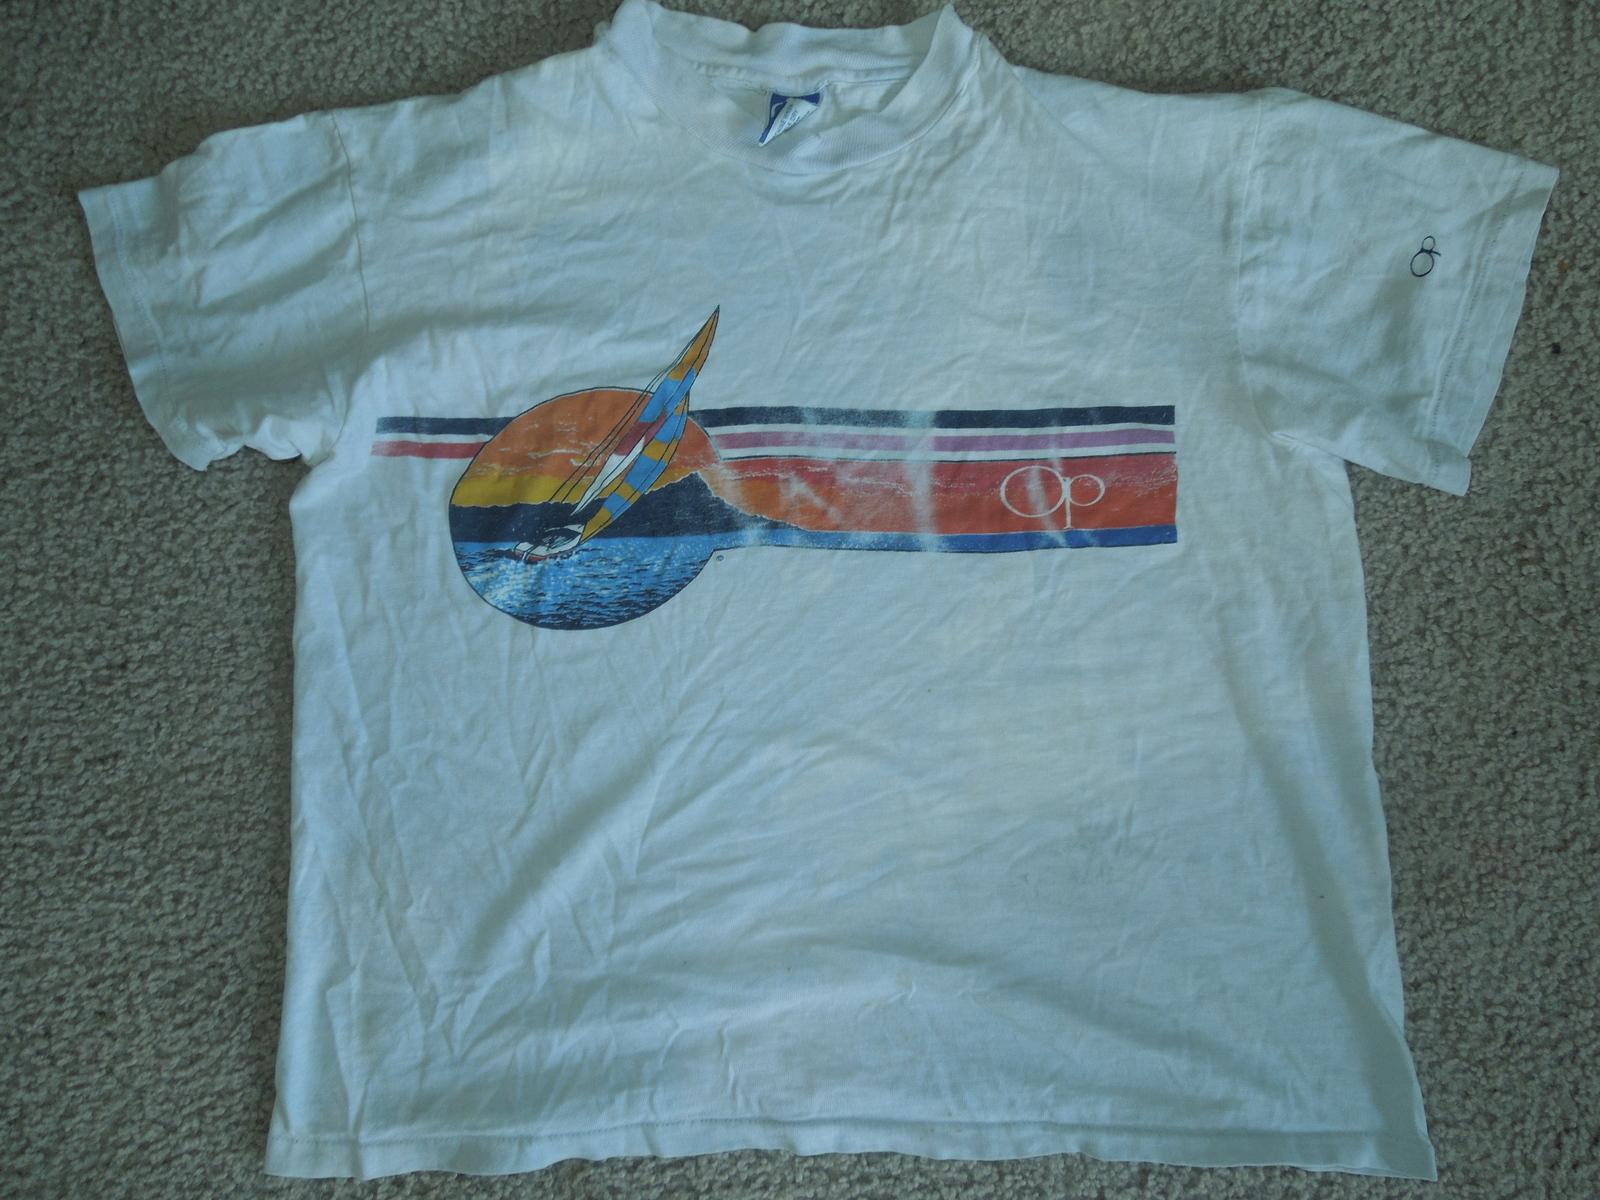 404dd646b70 Vintage 80's OP Ocean Pacific surf T-Shirt and 50 similar items. Dscn9406